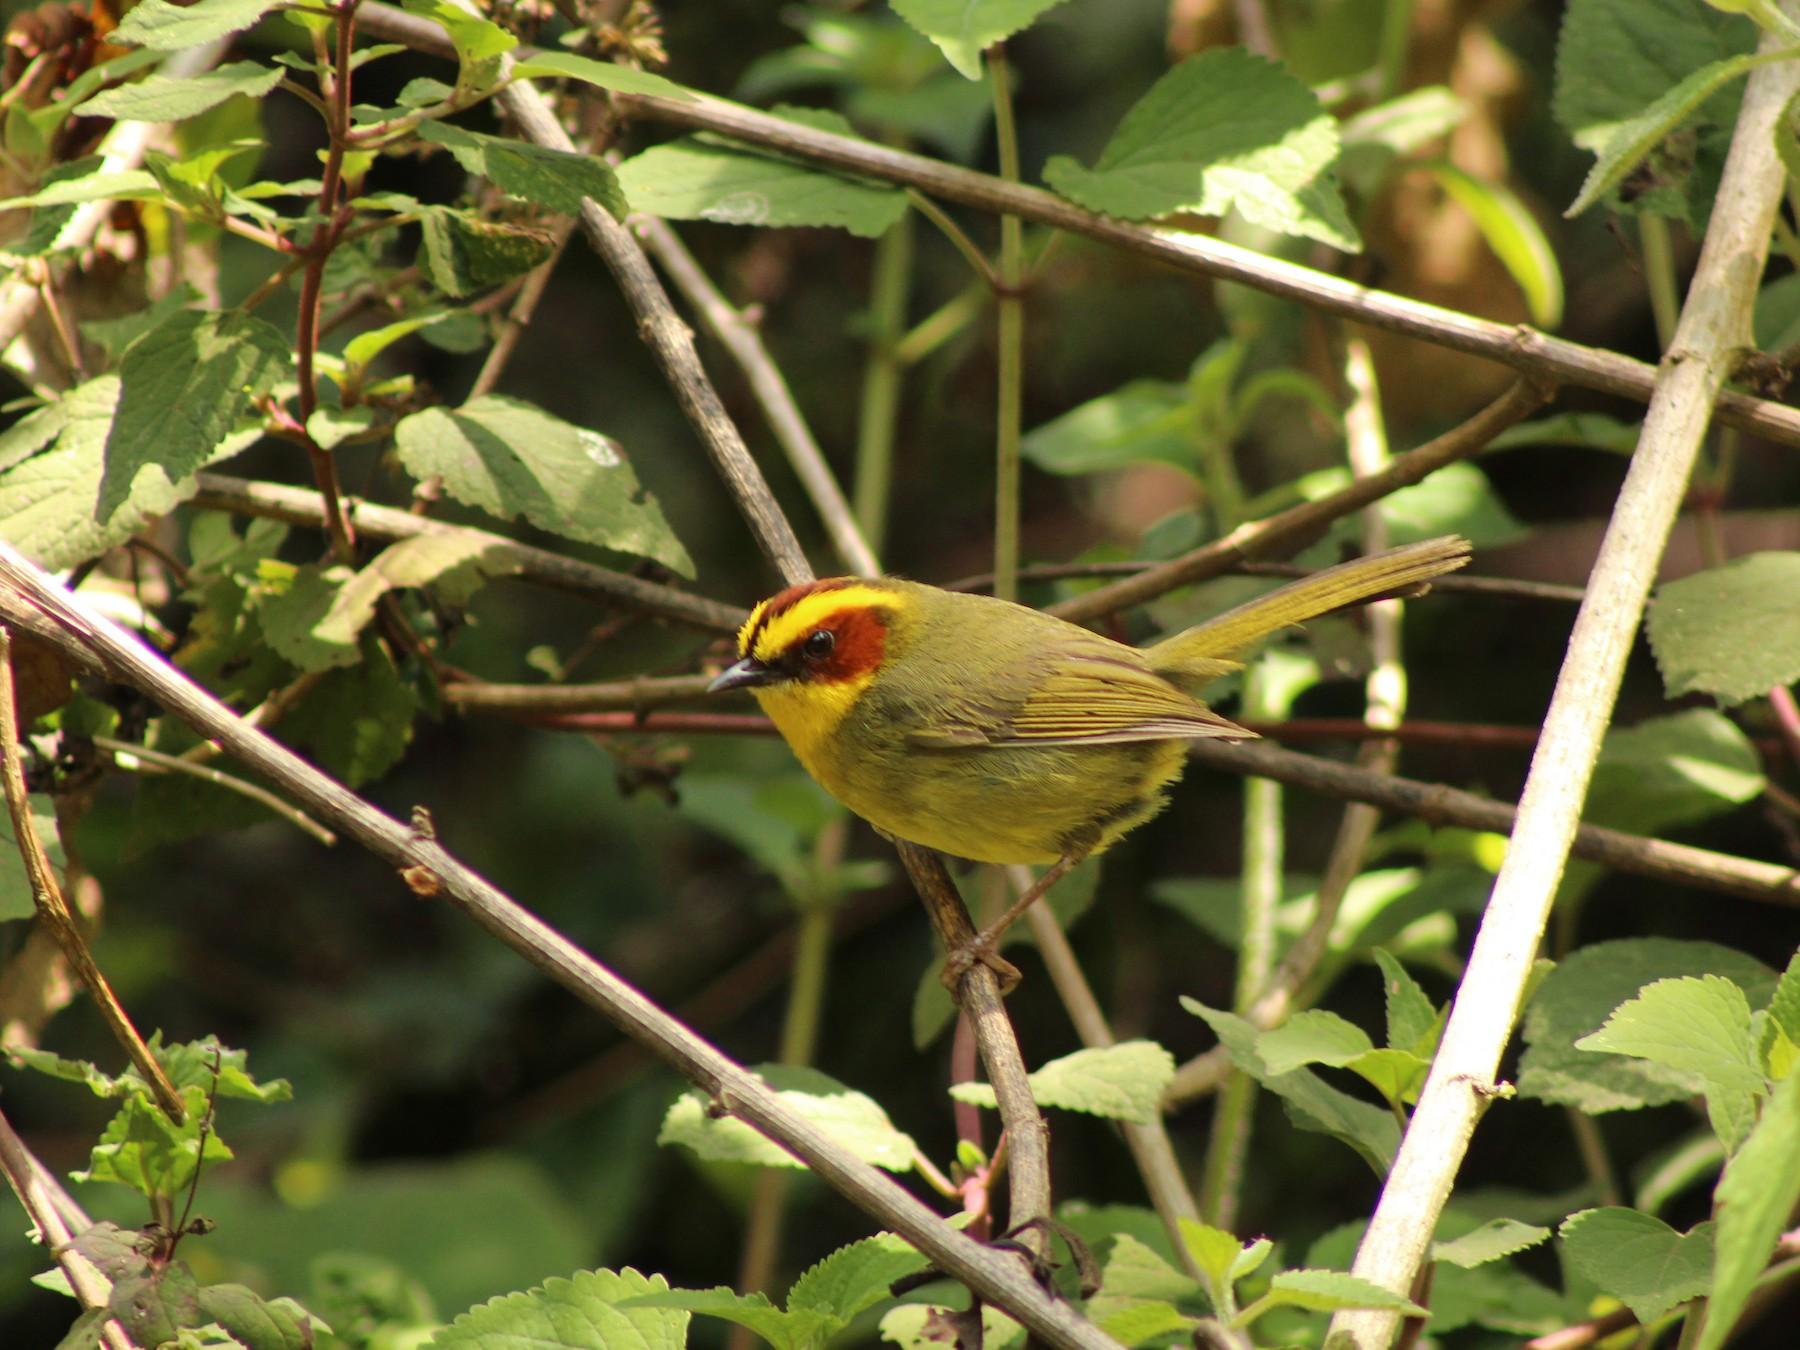 Golden-browed Warbler - Esteban  Matias